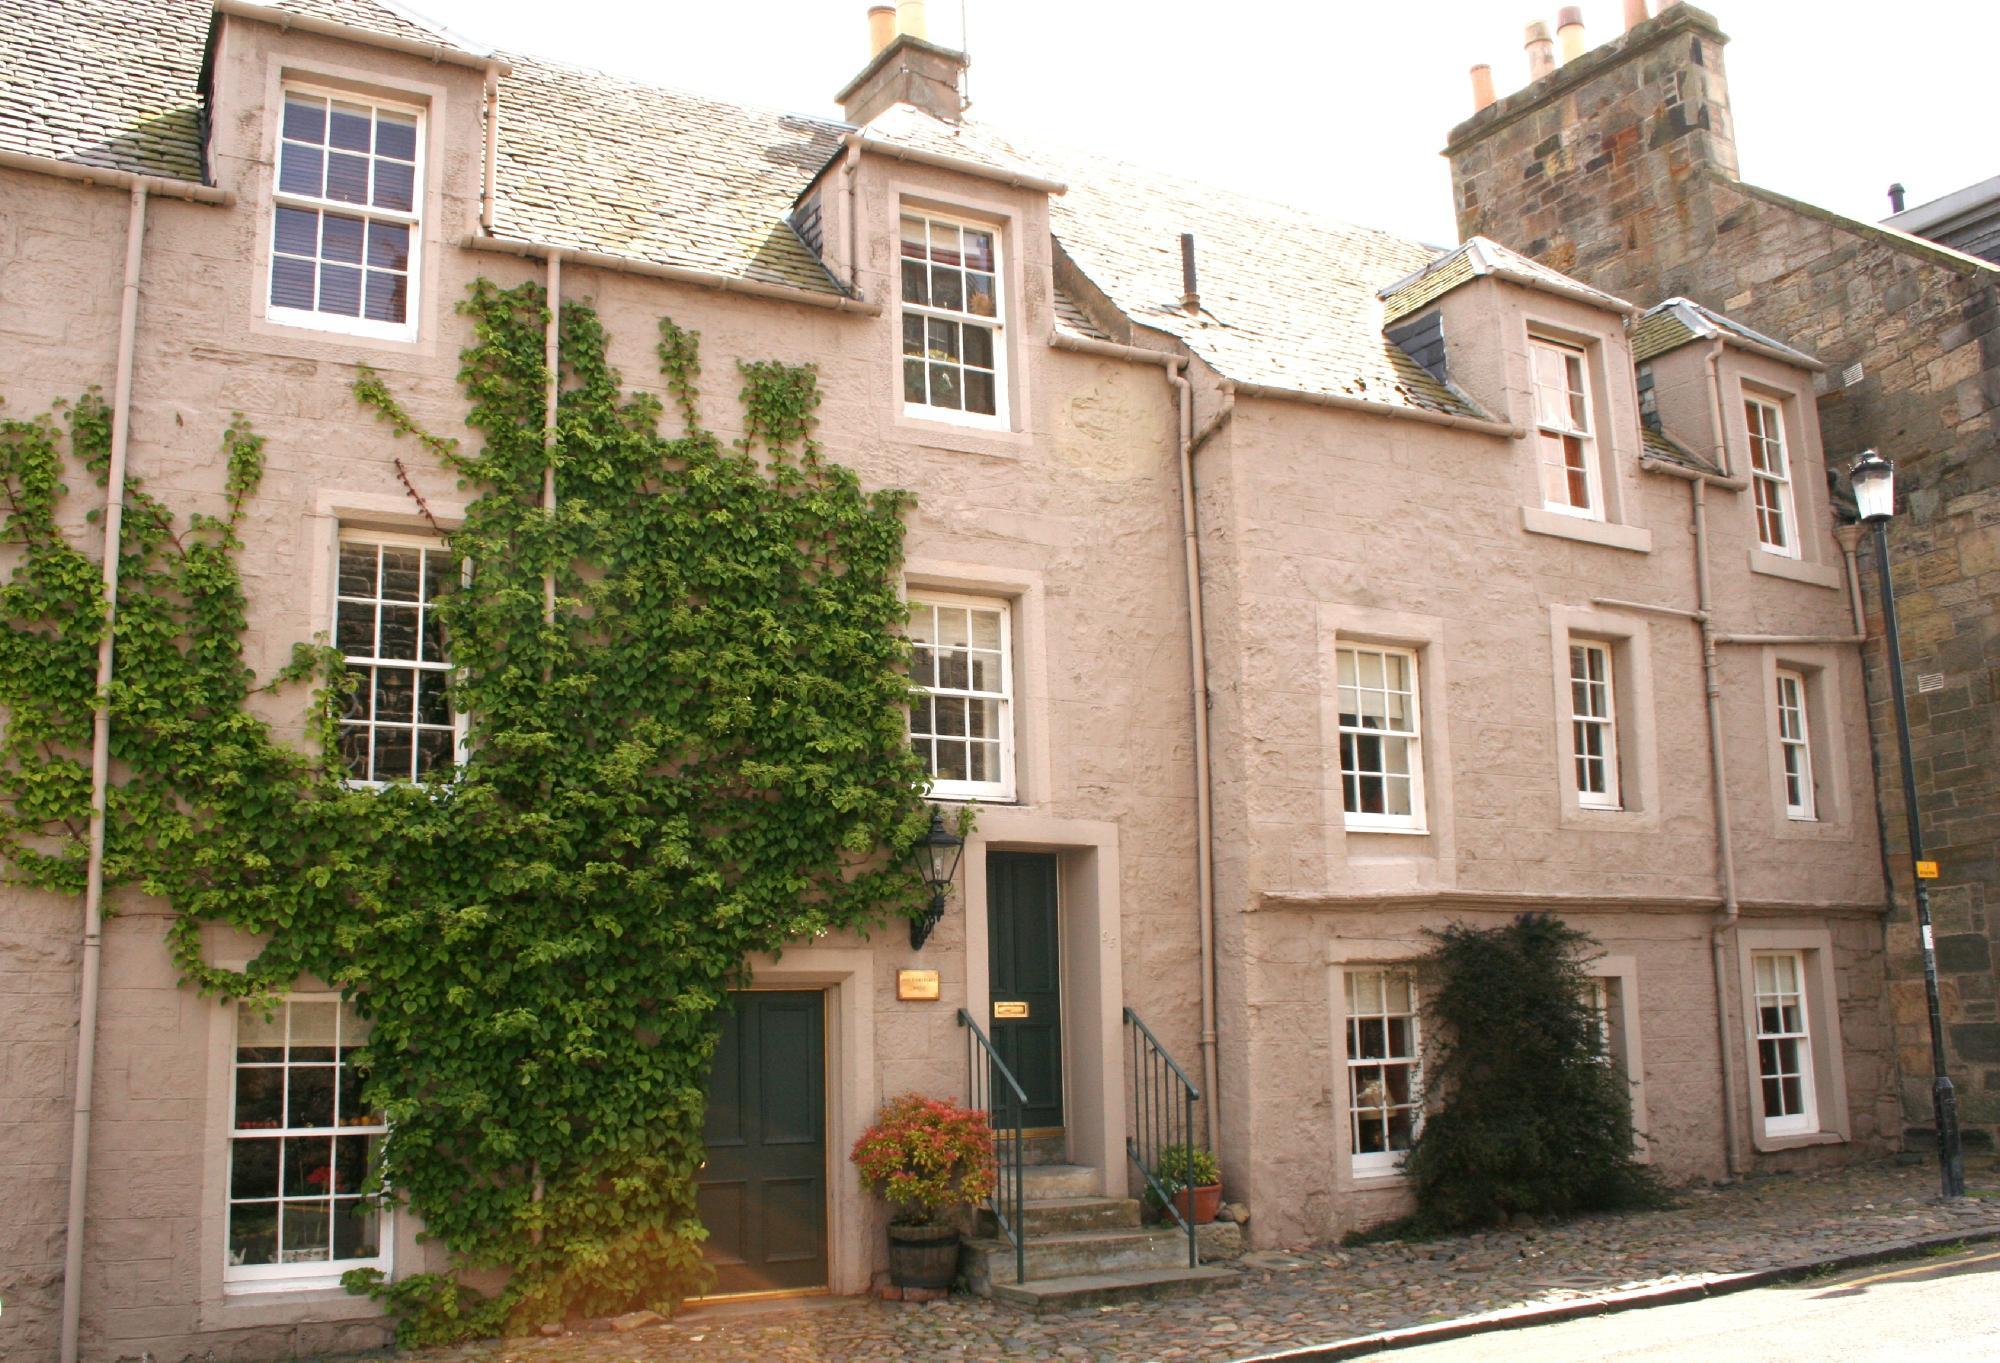 Old Fishergate House